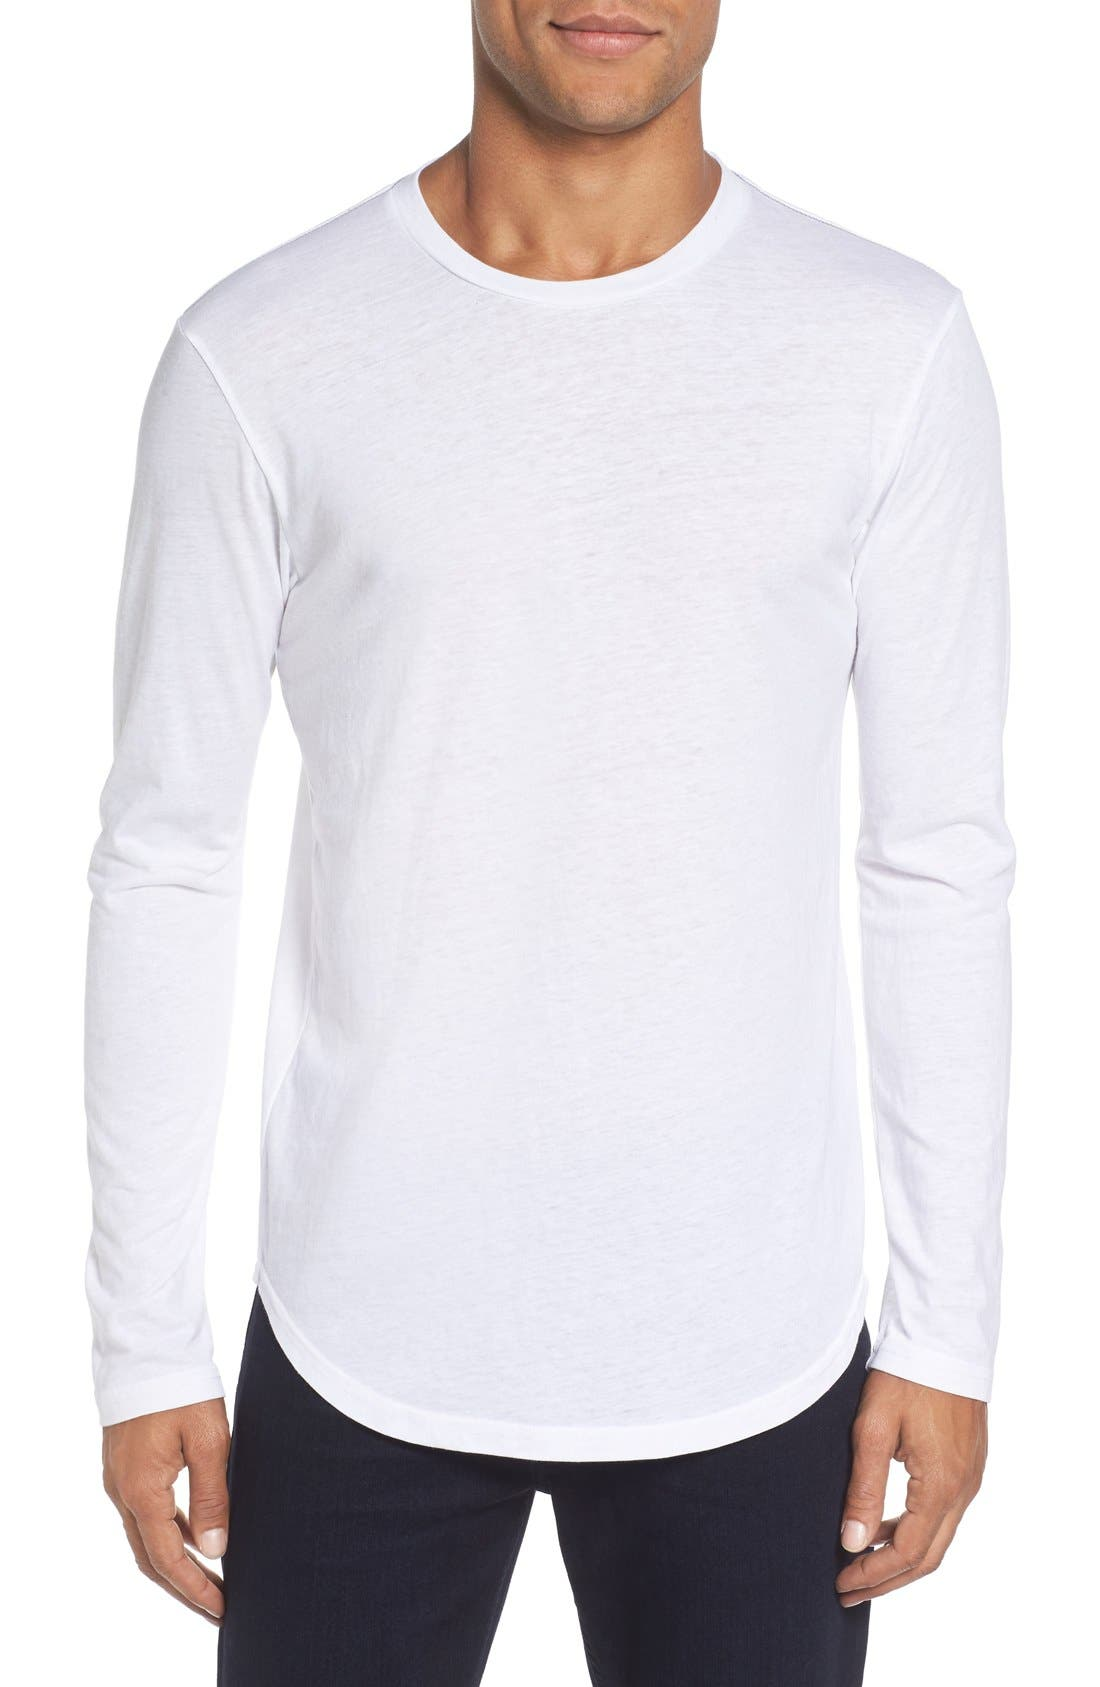 Goodlife Scalloped Hem Long Sleeve T-Shirt